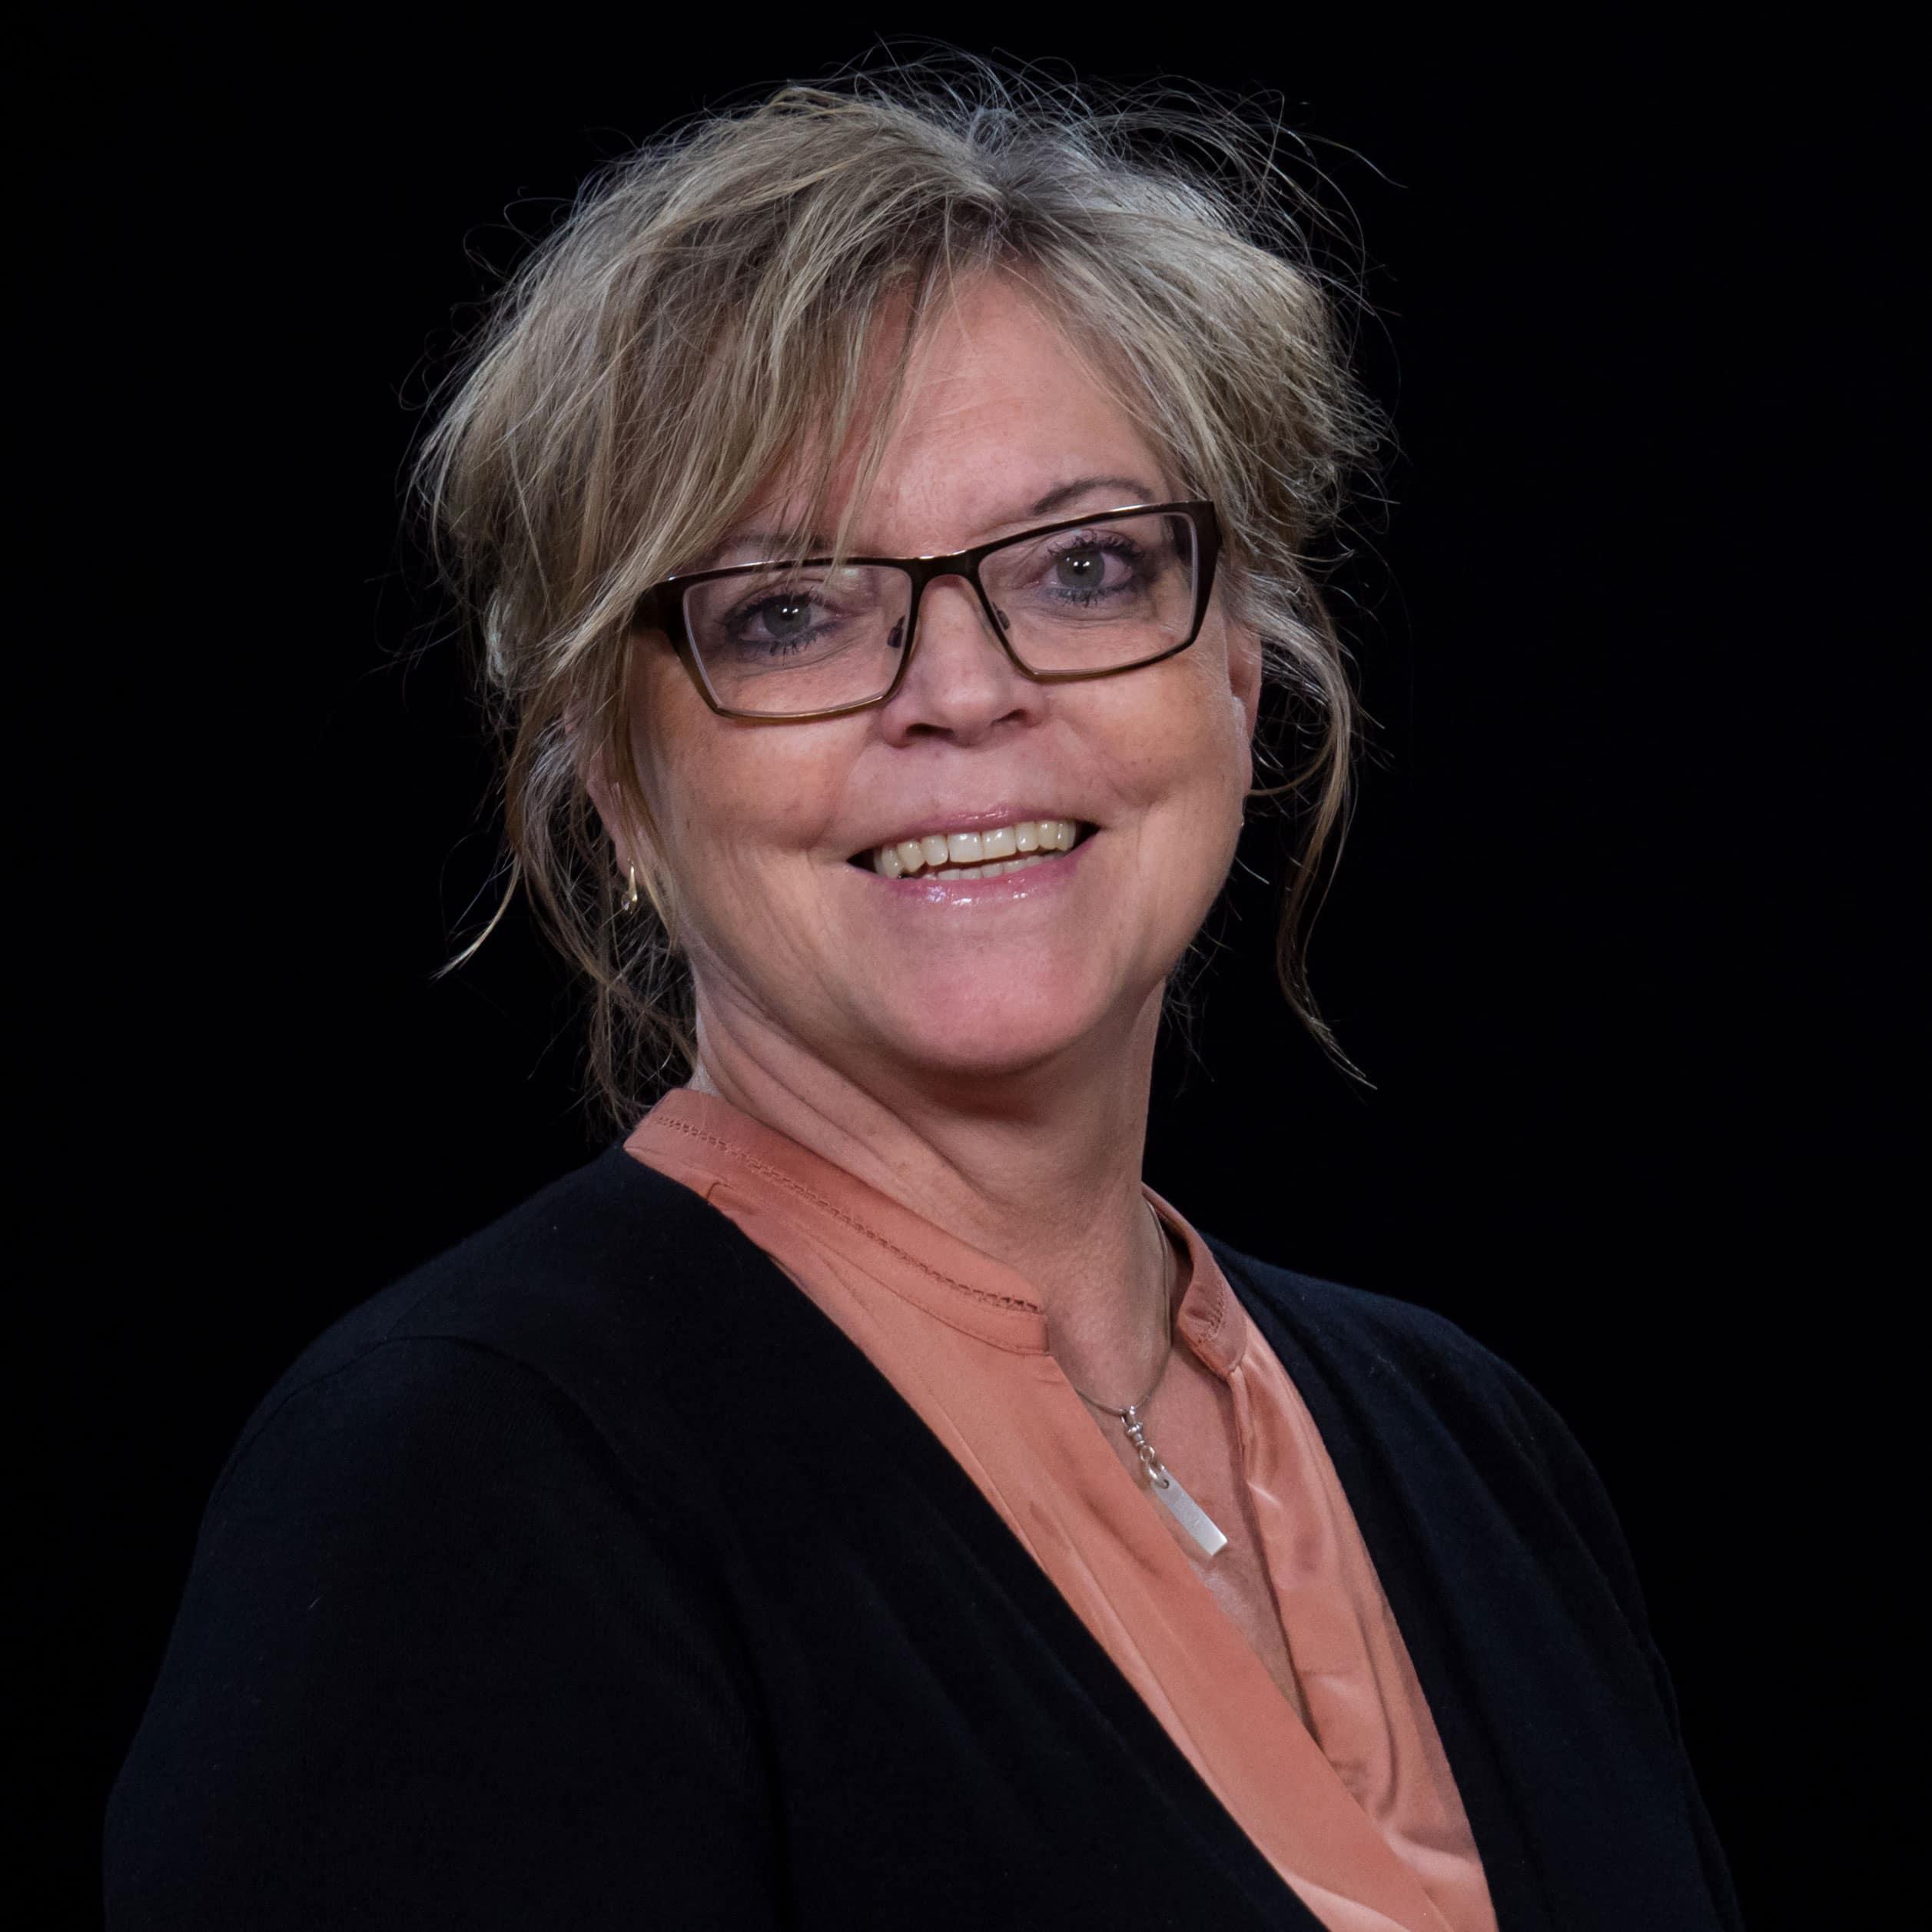 Karin Estmark